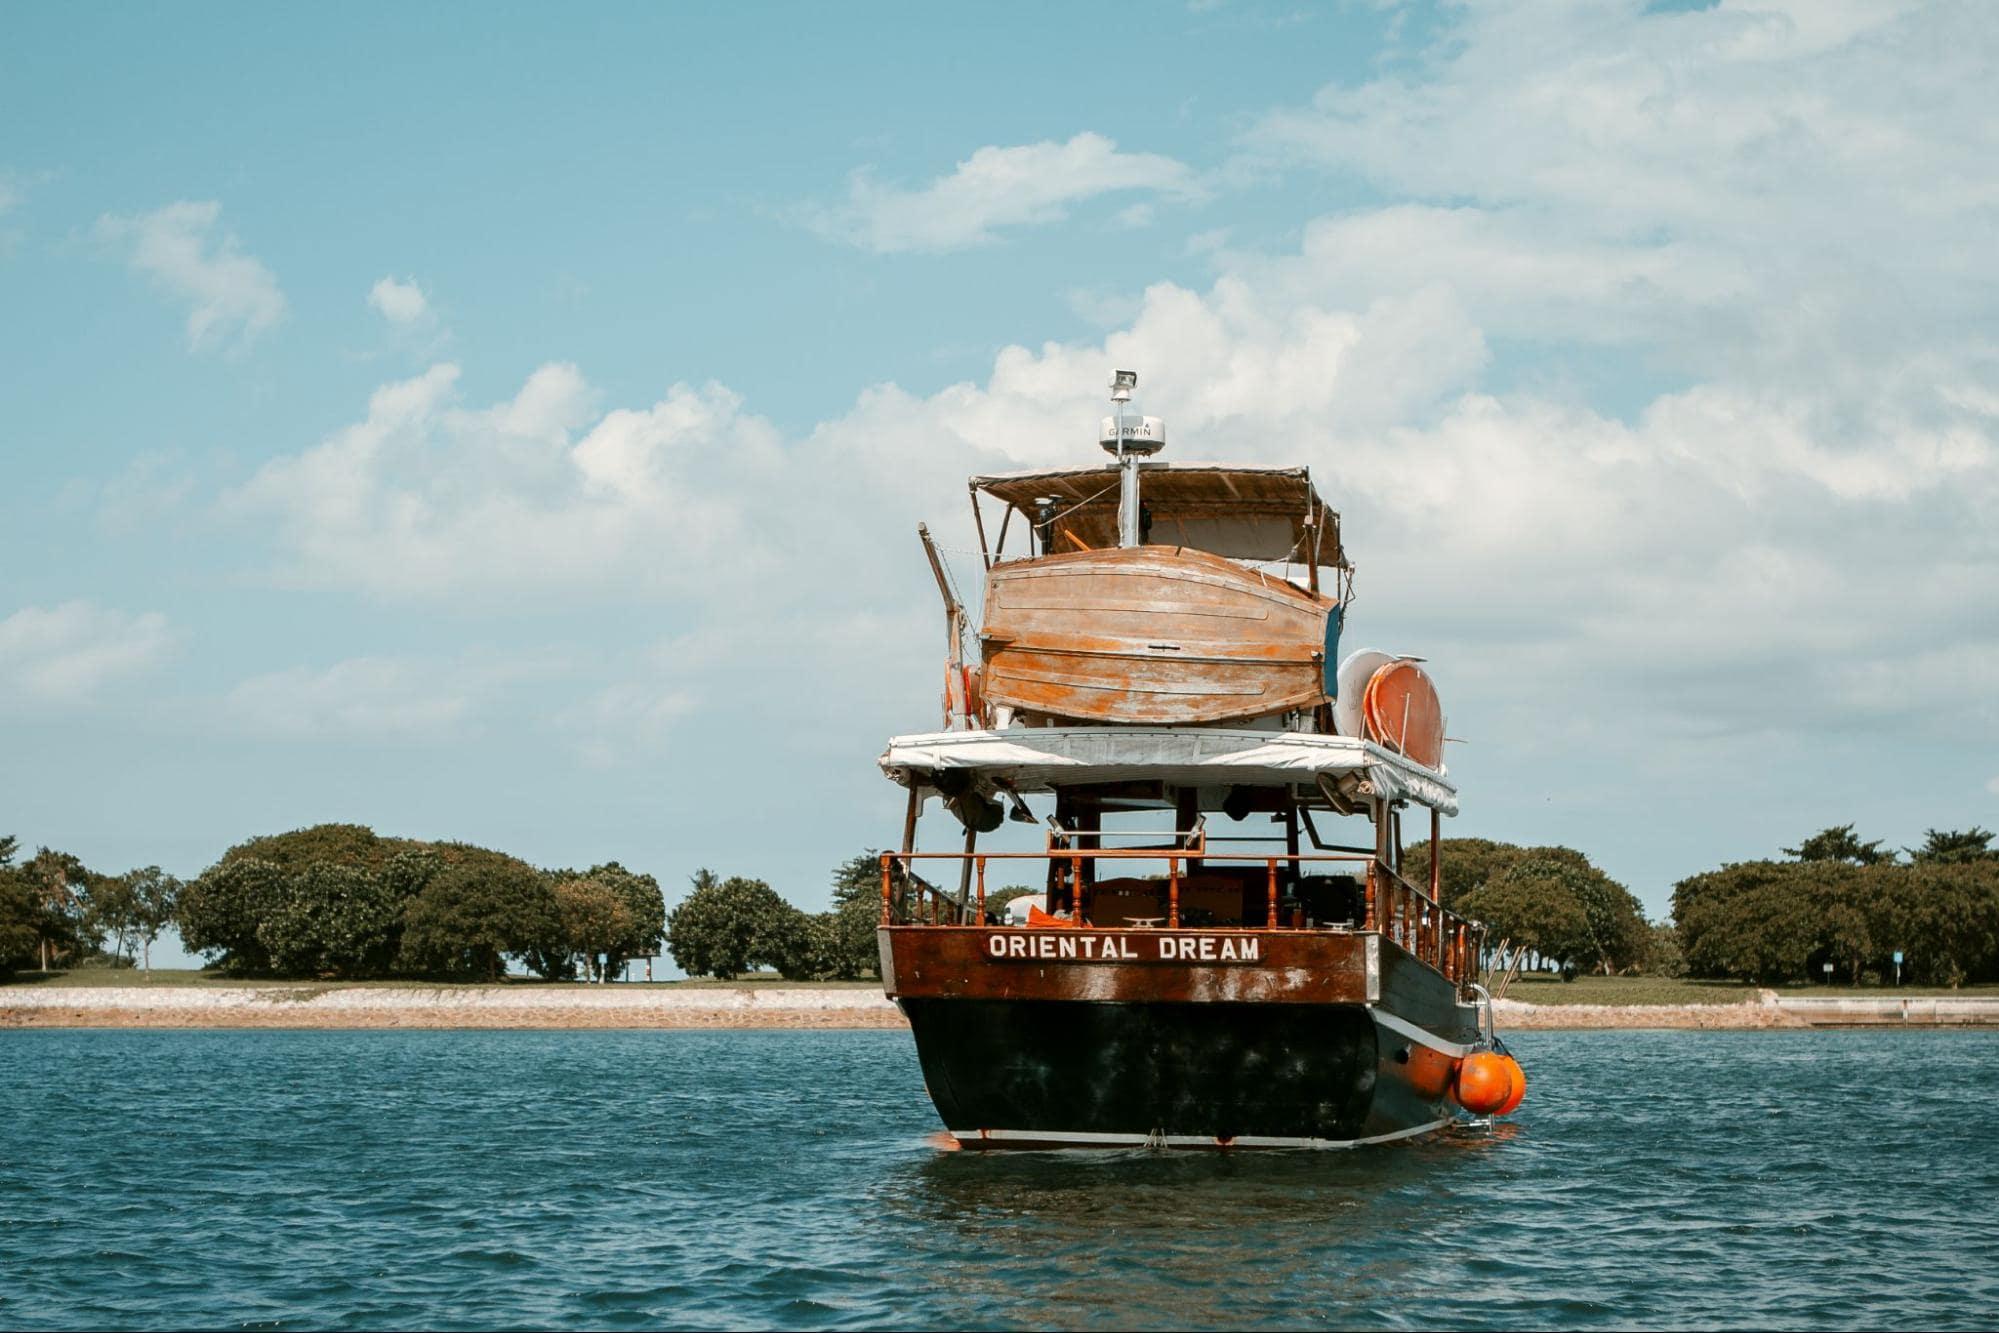 HK Junk Boat - HK Junk Boat experience